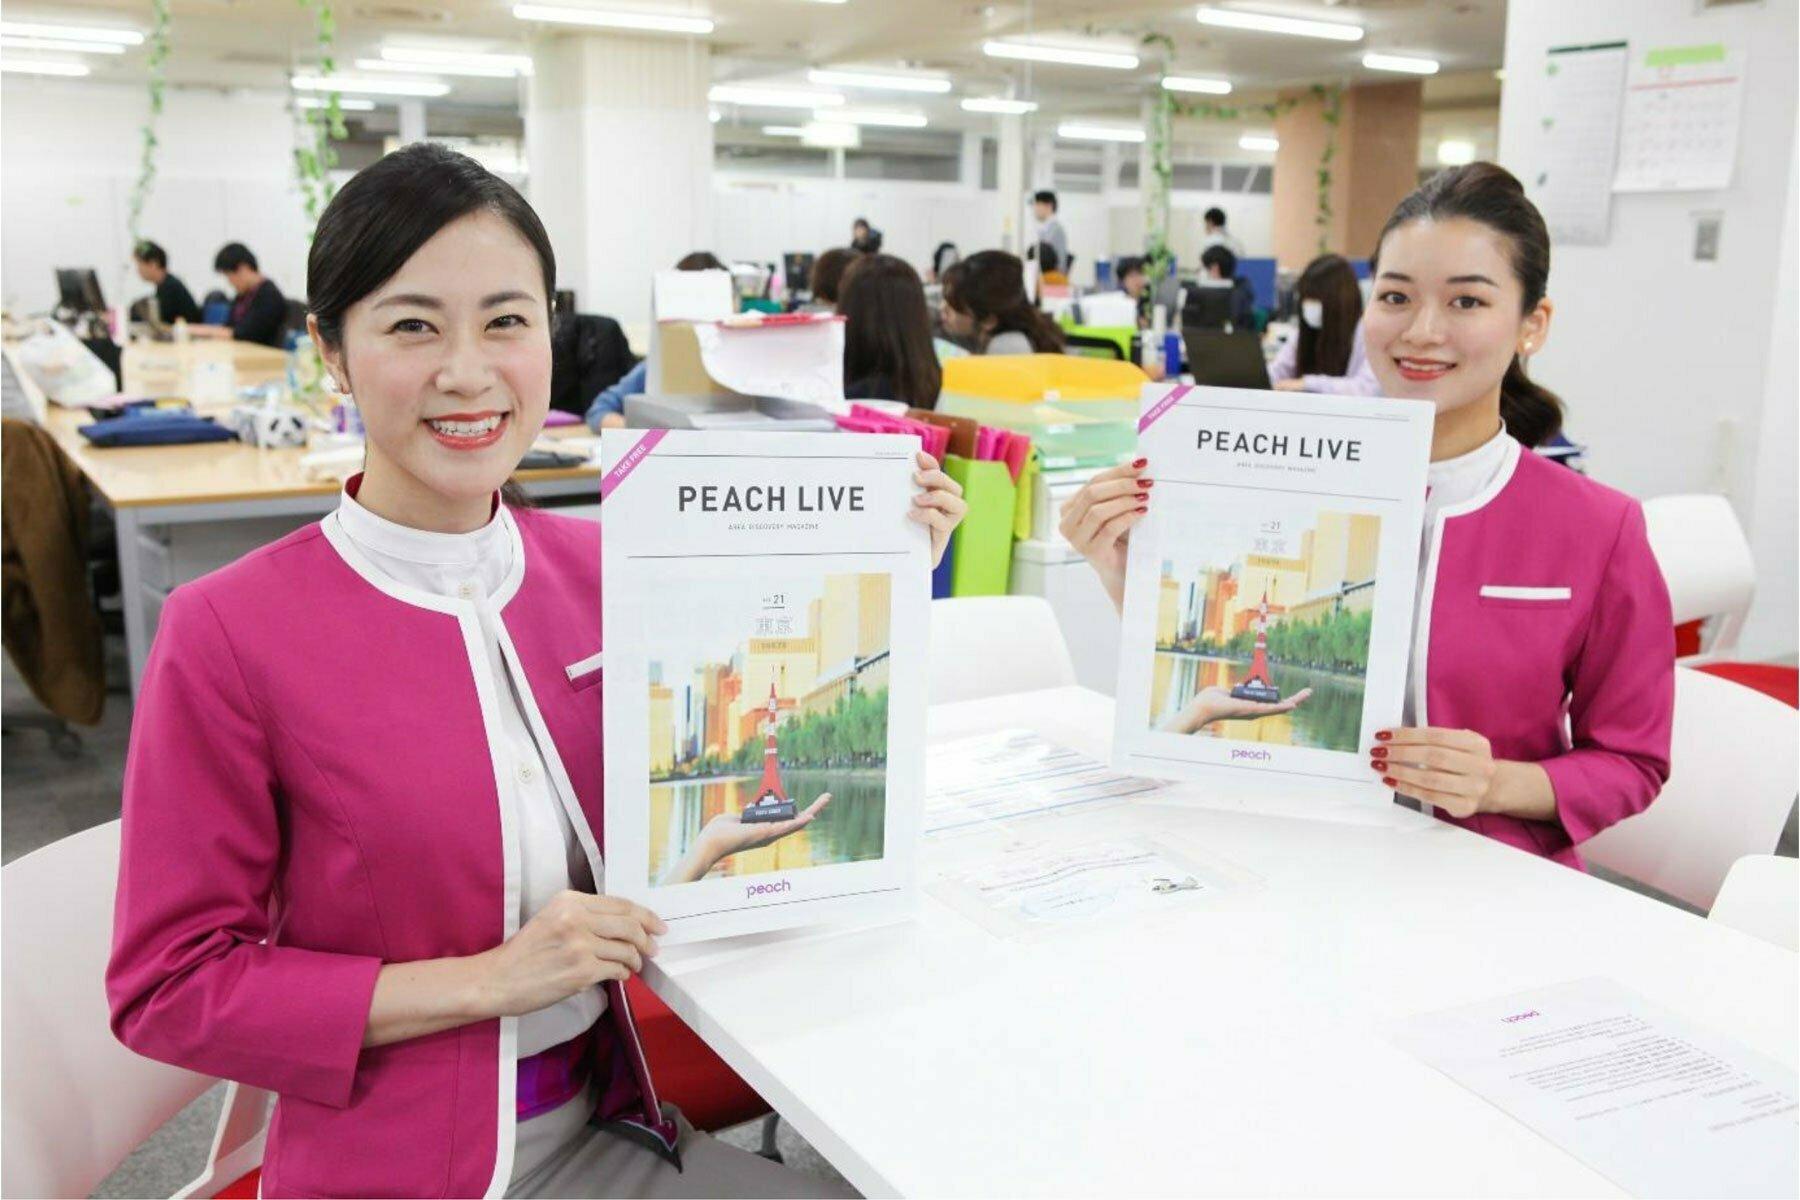 Peach Live Tokyo を手に持つキャビンアテンダント